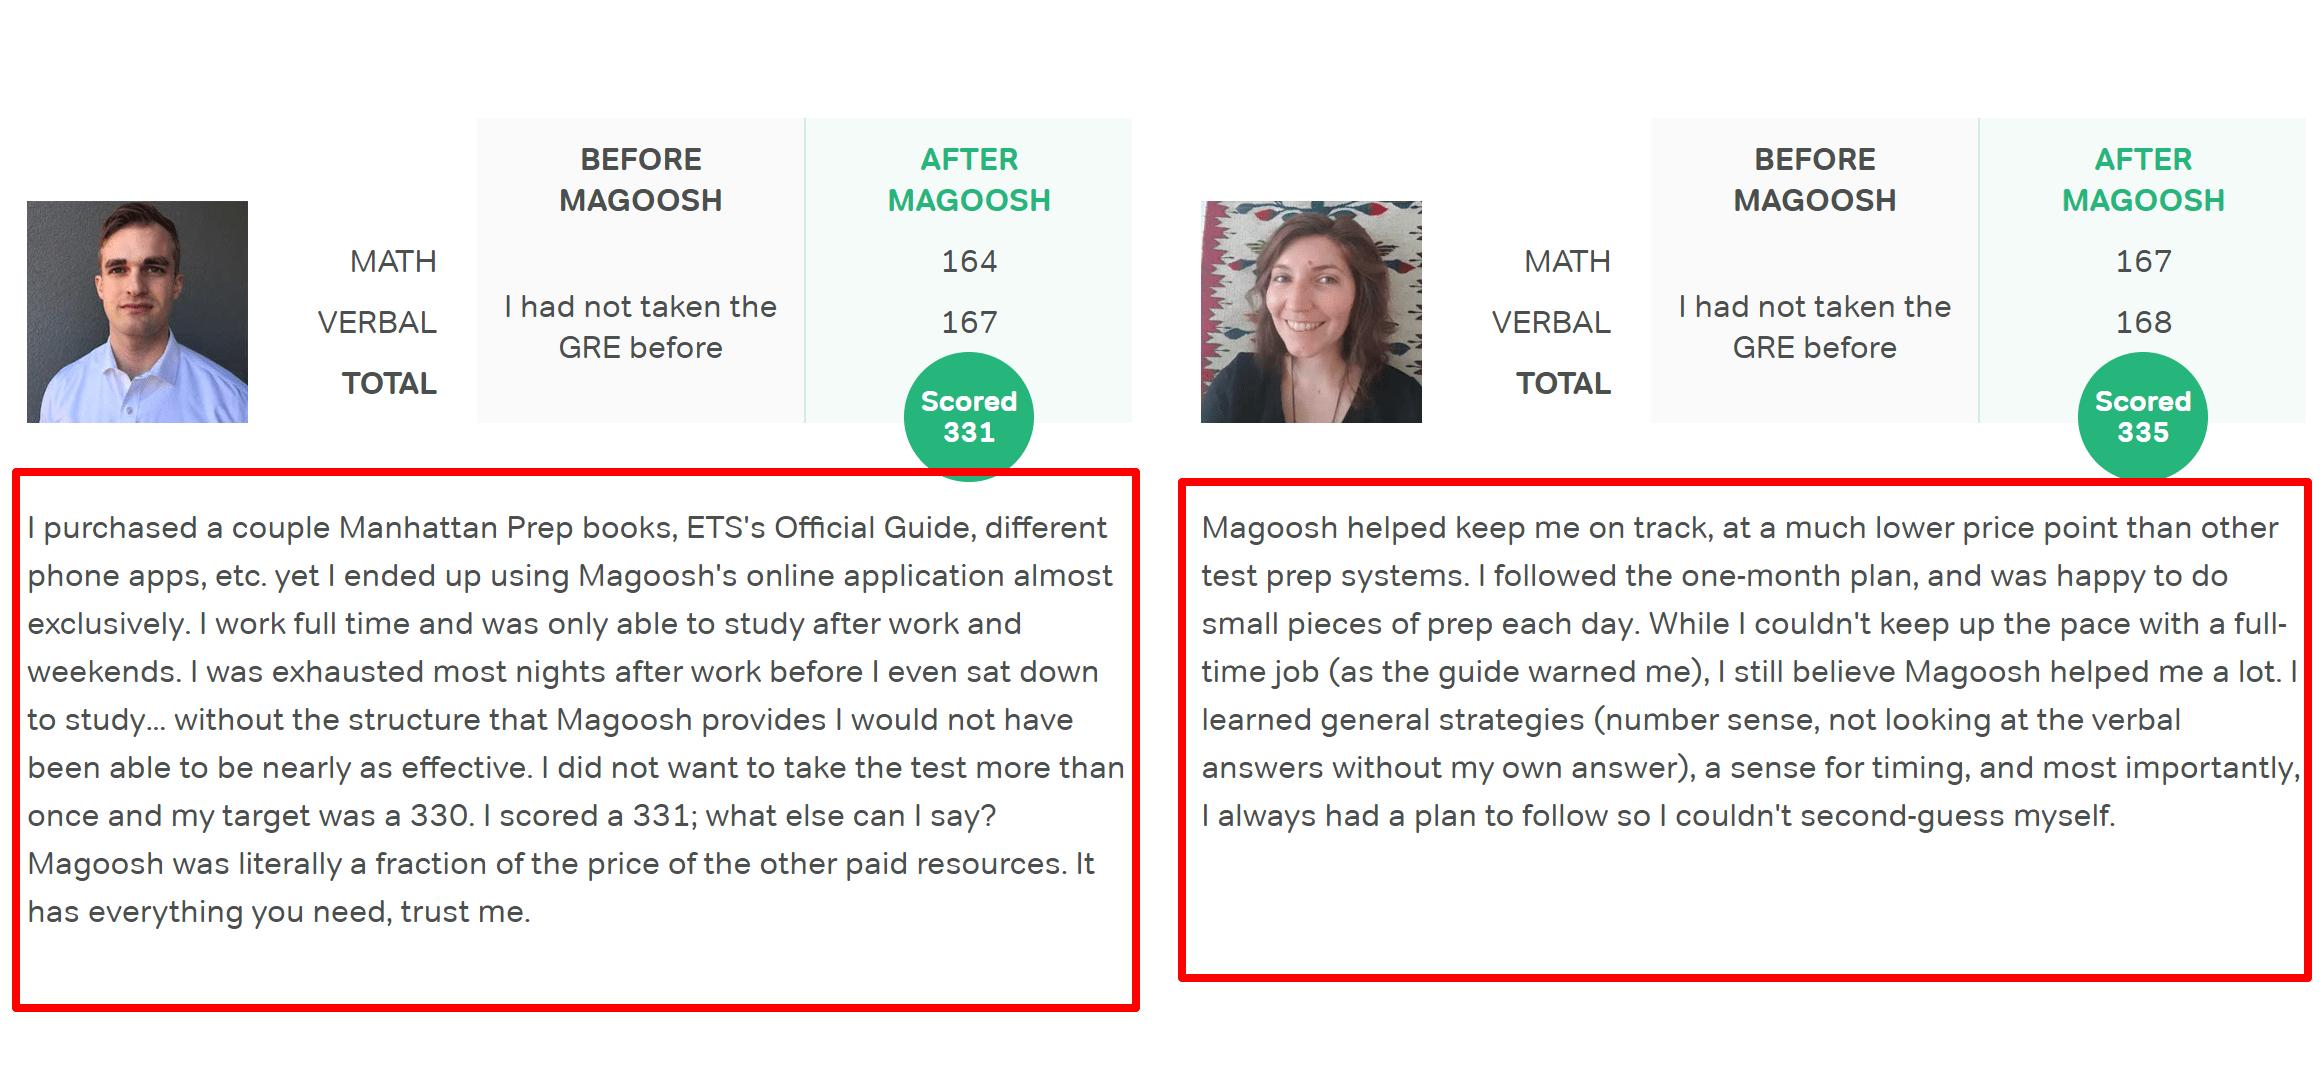 Magoosh customer reviews 2021- magoosh vs kaplan comparison